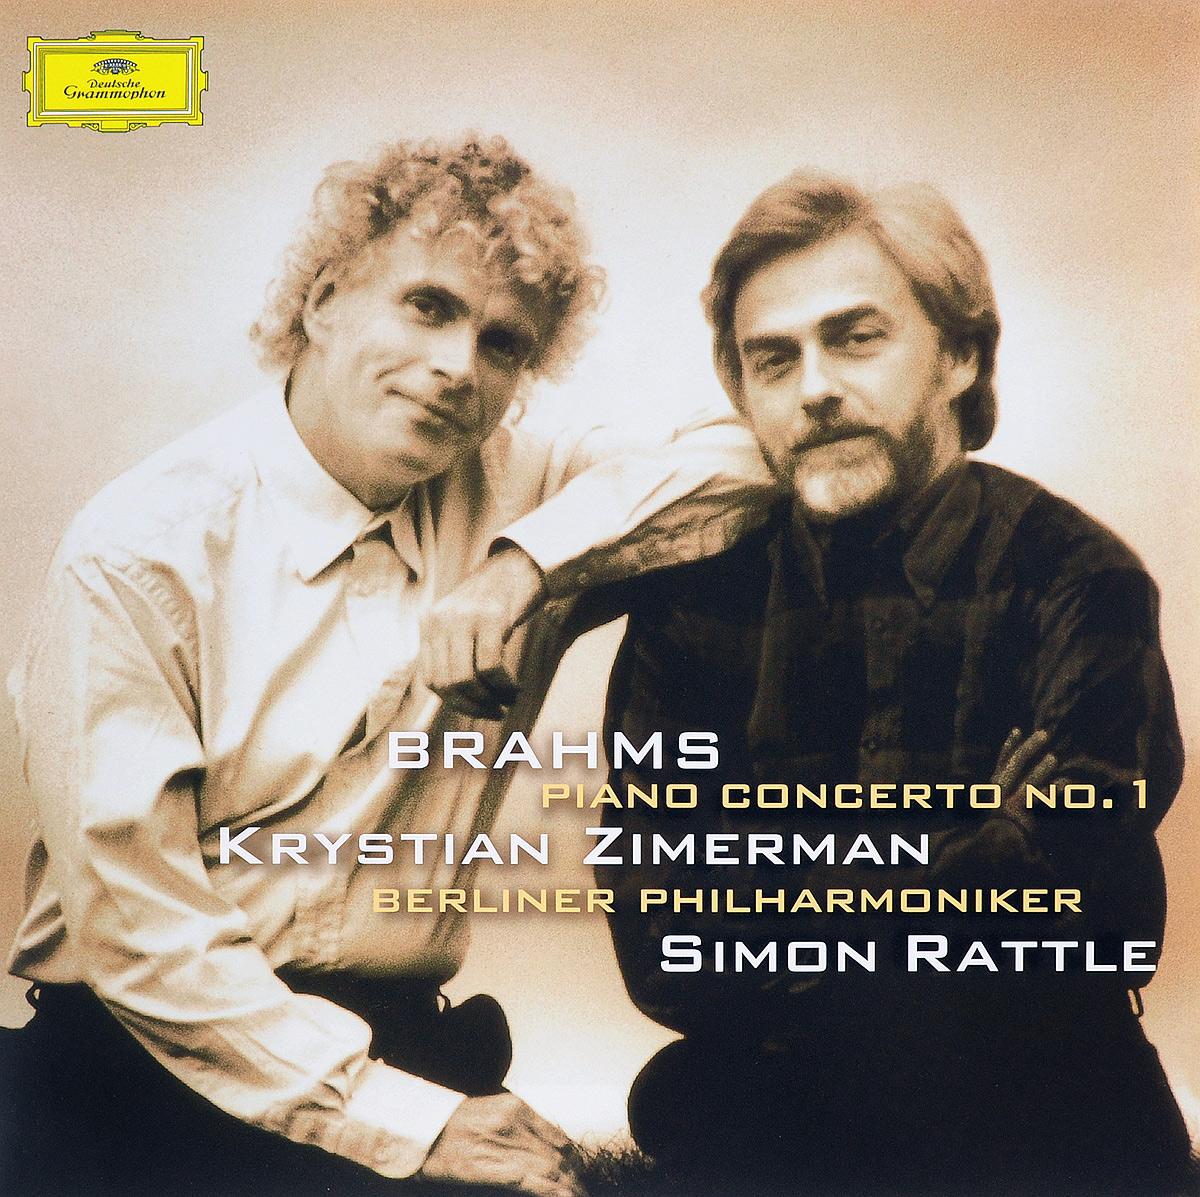 лучшая цена Кристиан Цимерман,Berliner Philharmoniker,Саймон Рэттл Krystian Zimerman. Brahms. Piano Concerto No. 1 (LP)